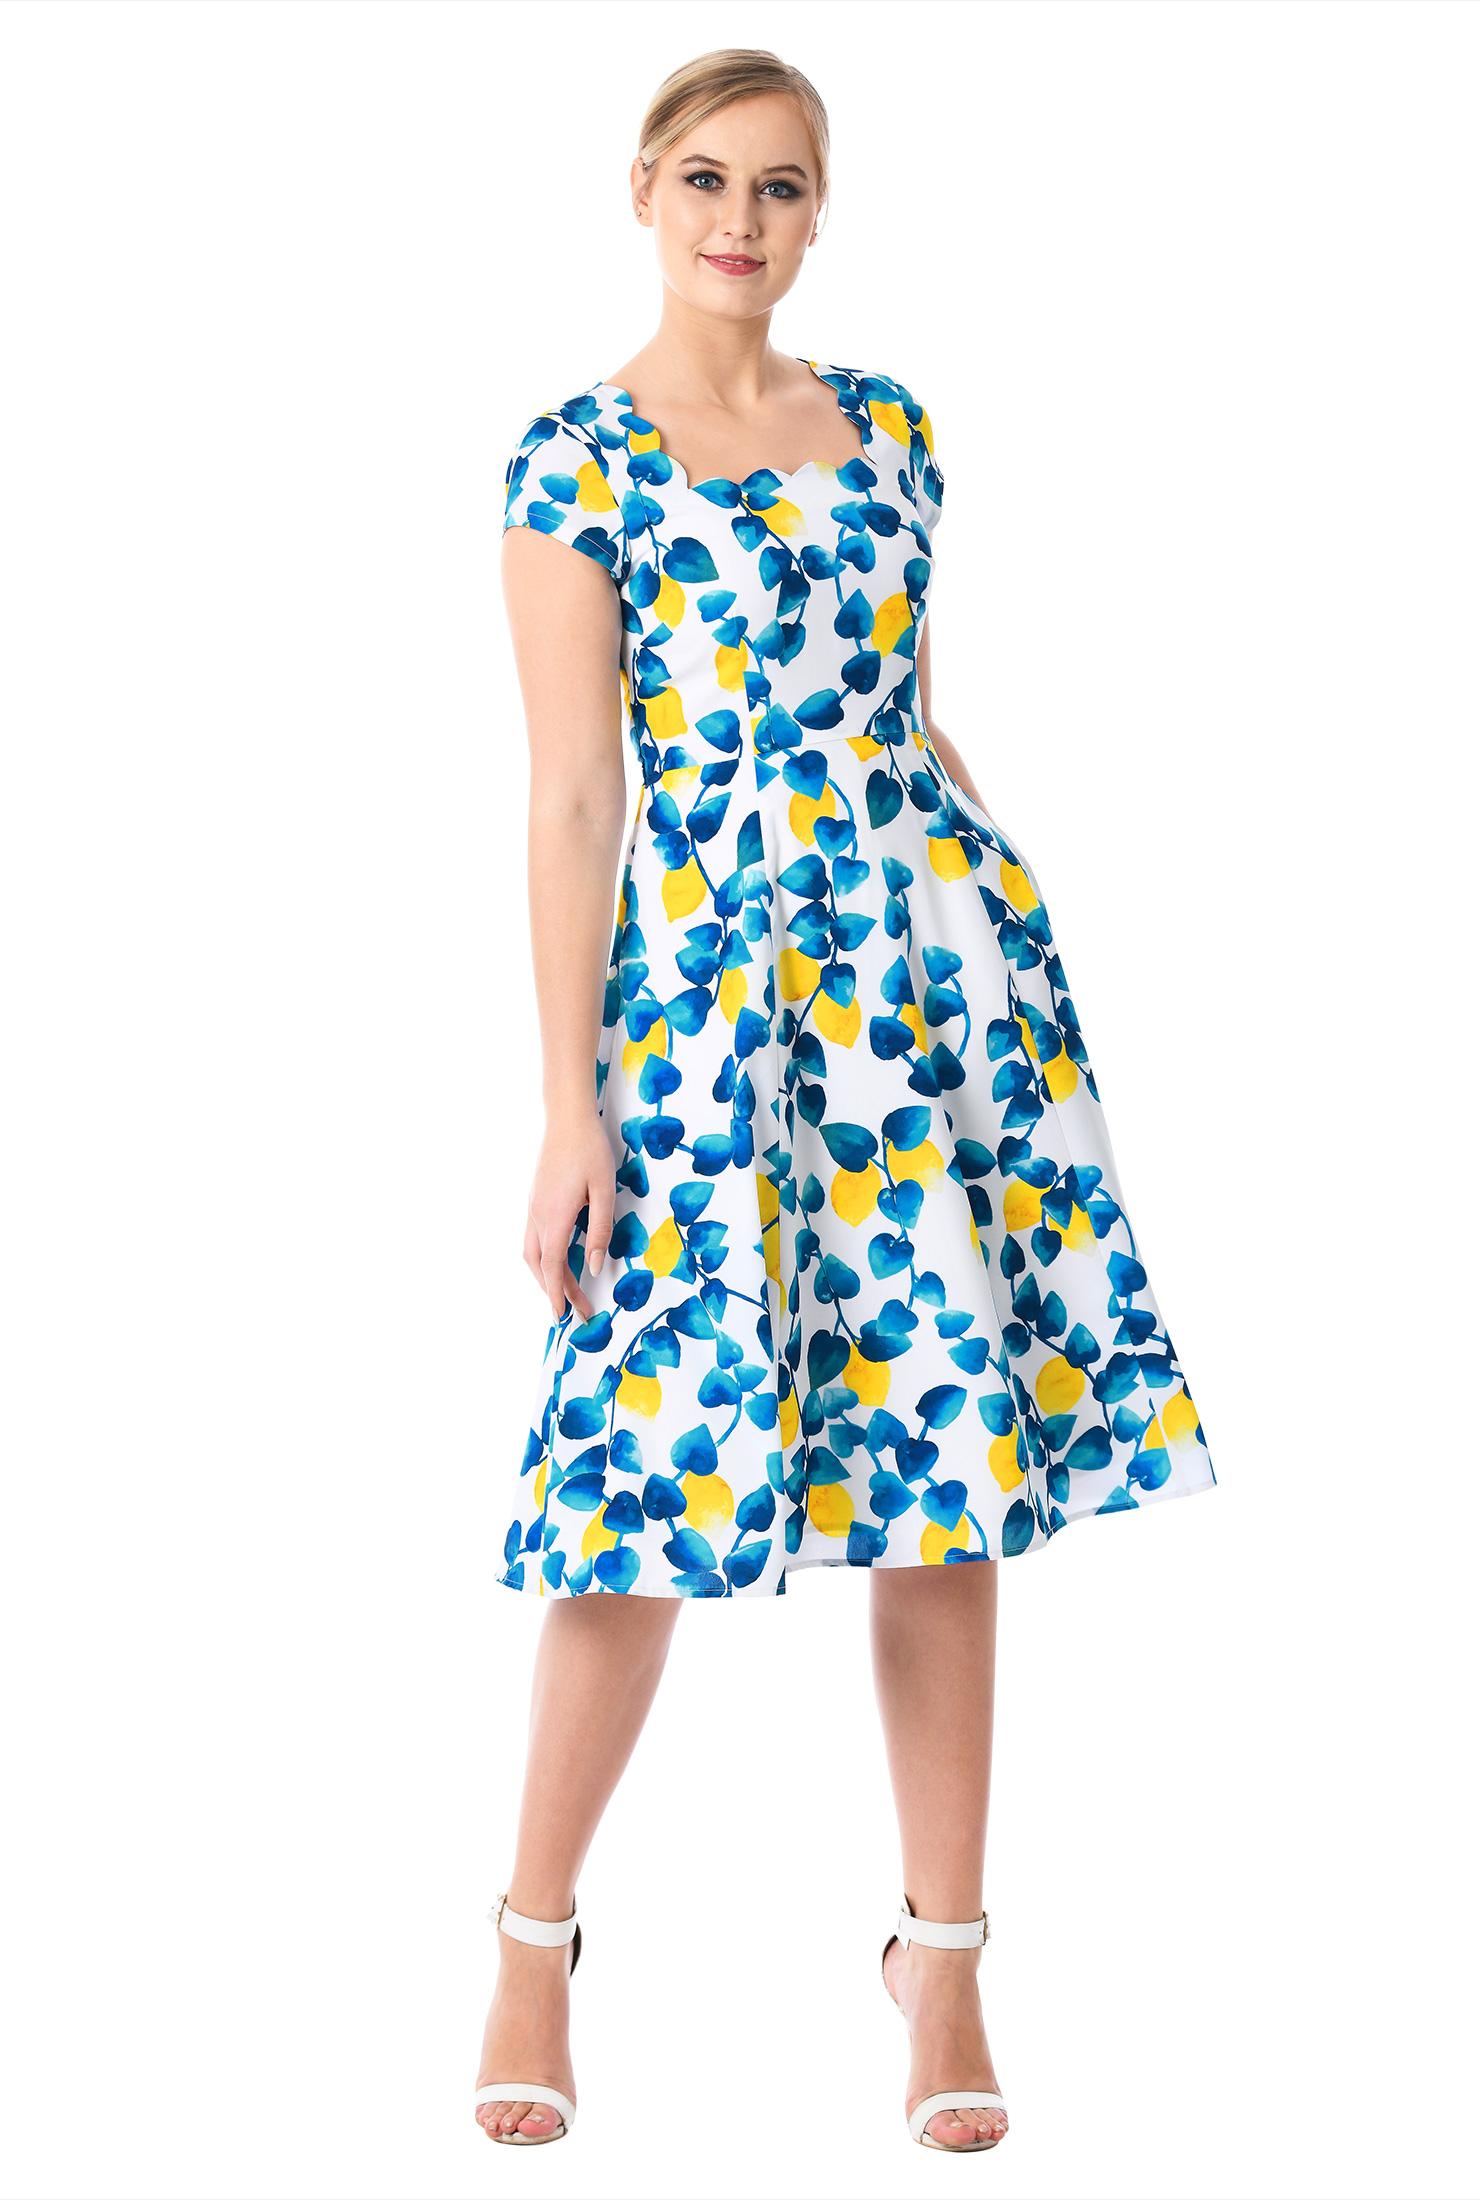 2966edcf887 Women s Fashion Clothing 0-36W and Custom